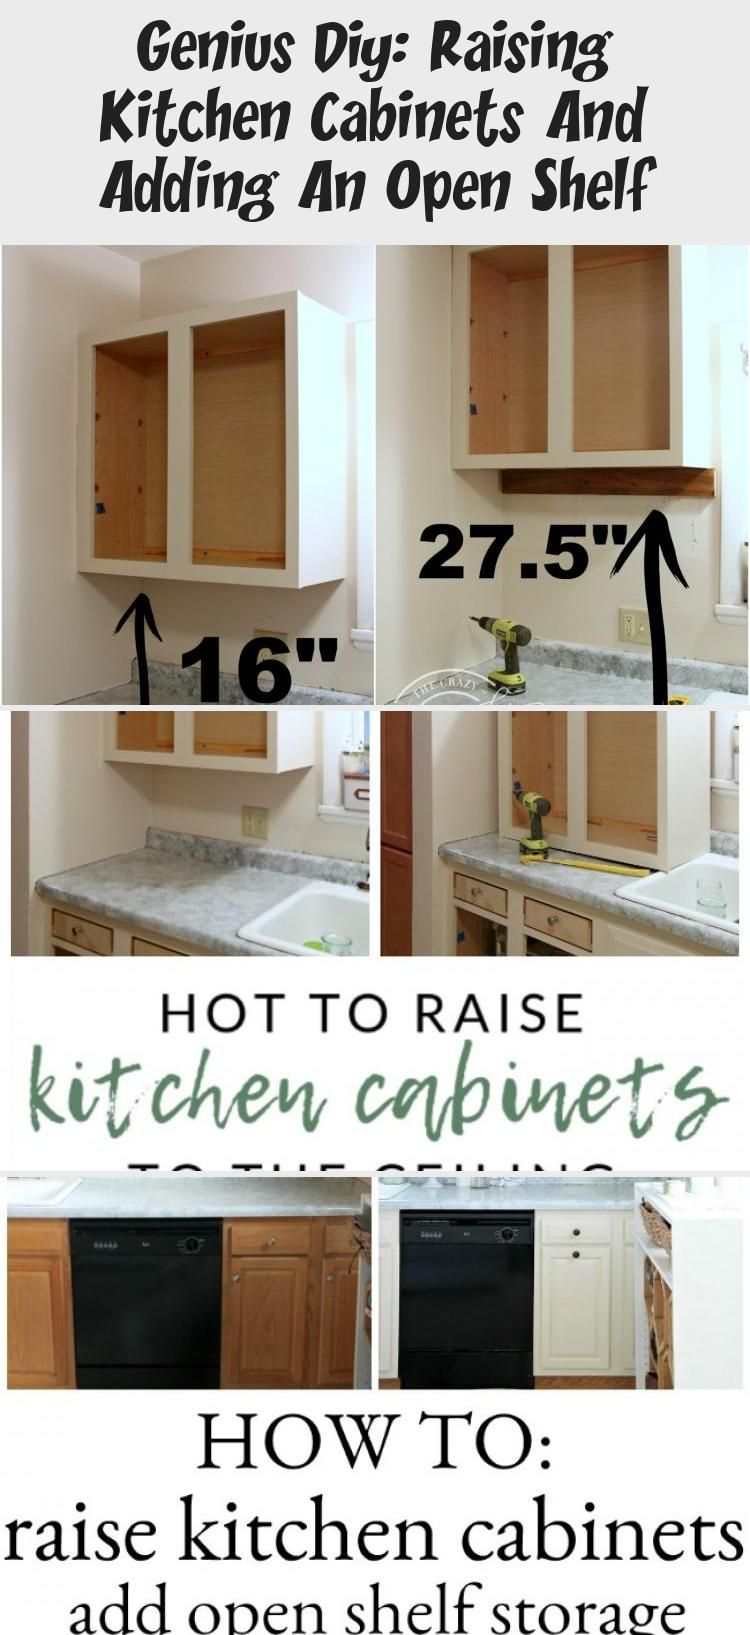 Genius Diy Raising Kitchen Cabinets And Adding An Open Shelf Diy Kitchen Shelves Kitchen Cabinets Diy Shelf Decor